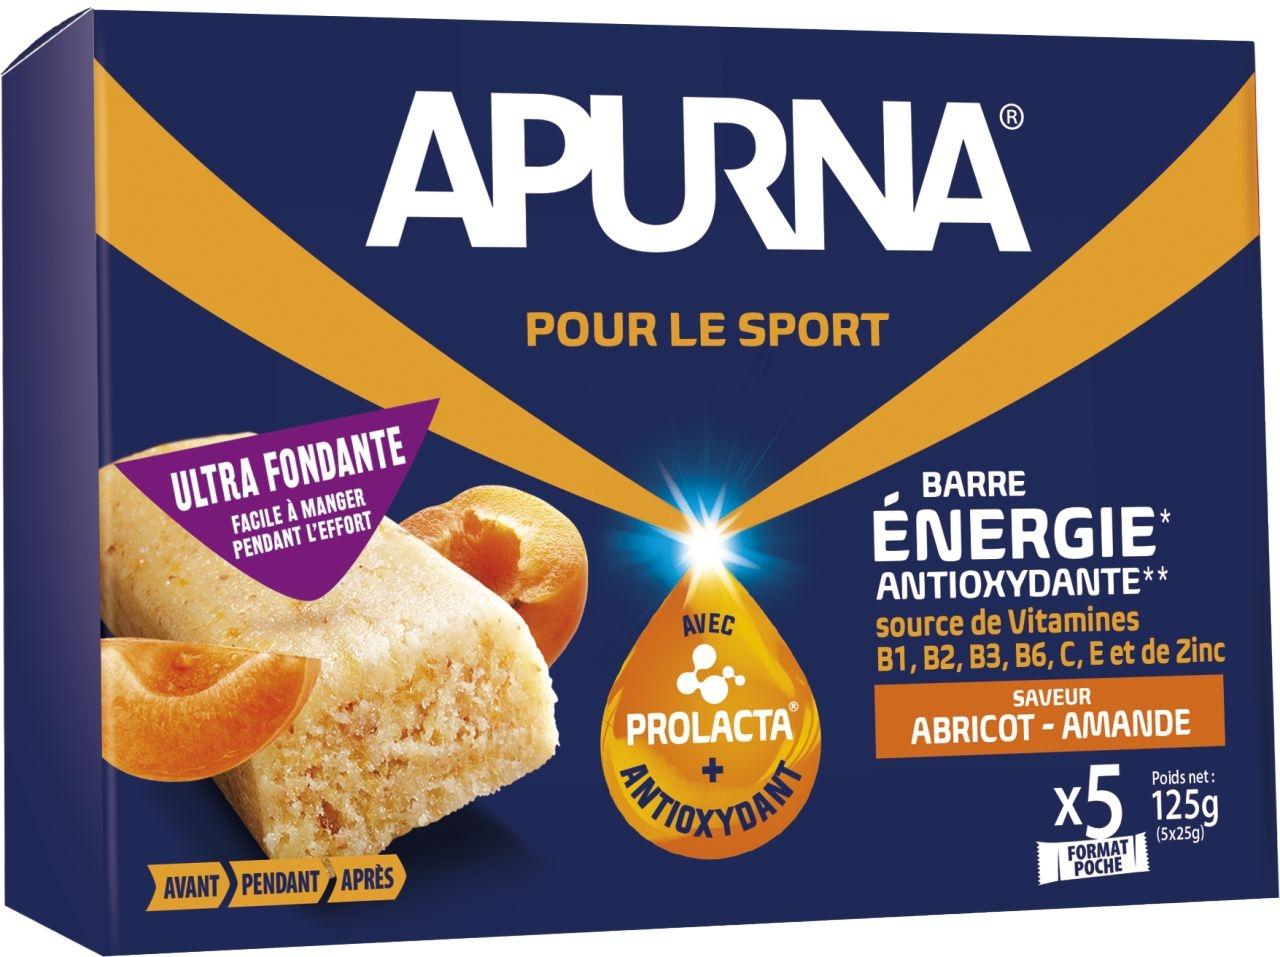 Barre fondante Apurna Abricot/Amande Étui 5x25 g